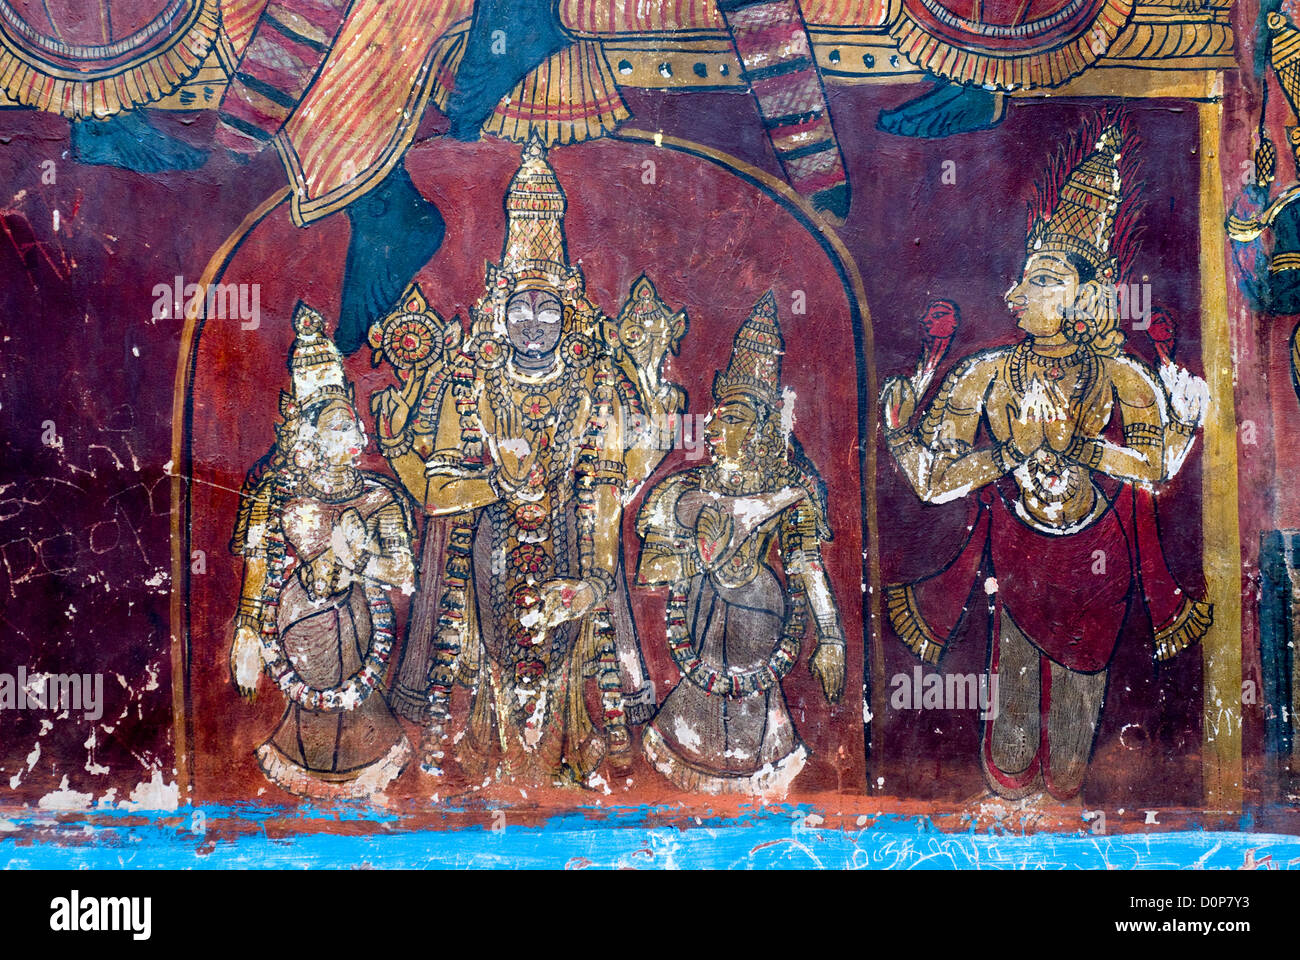 17th century Murals in Varadaraja Perumal (Vishnu) temple in kanchipuram,  Tamil Nadu, India Stock Photo - Alamy